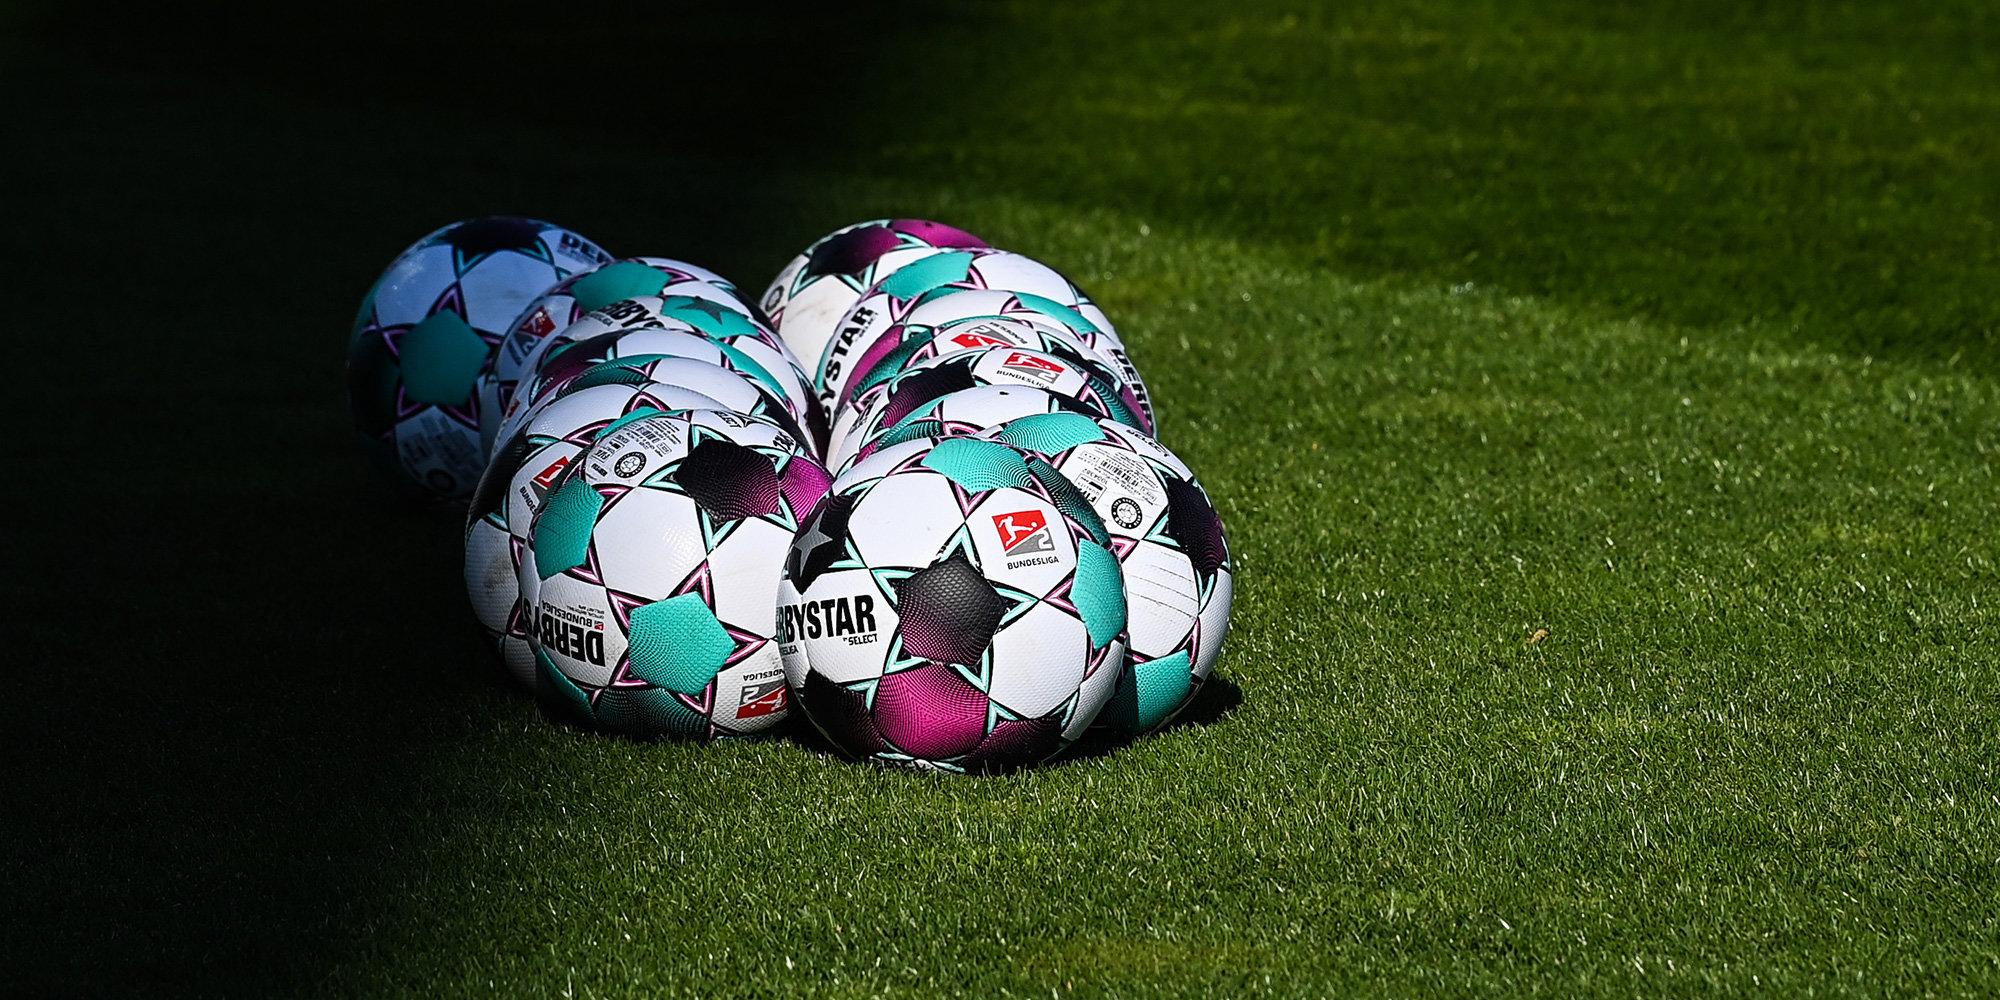 Три команды РПЛ интересуются форвардом клуба «Фатих Карагюмрюк»